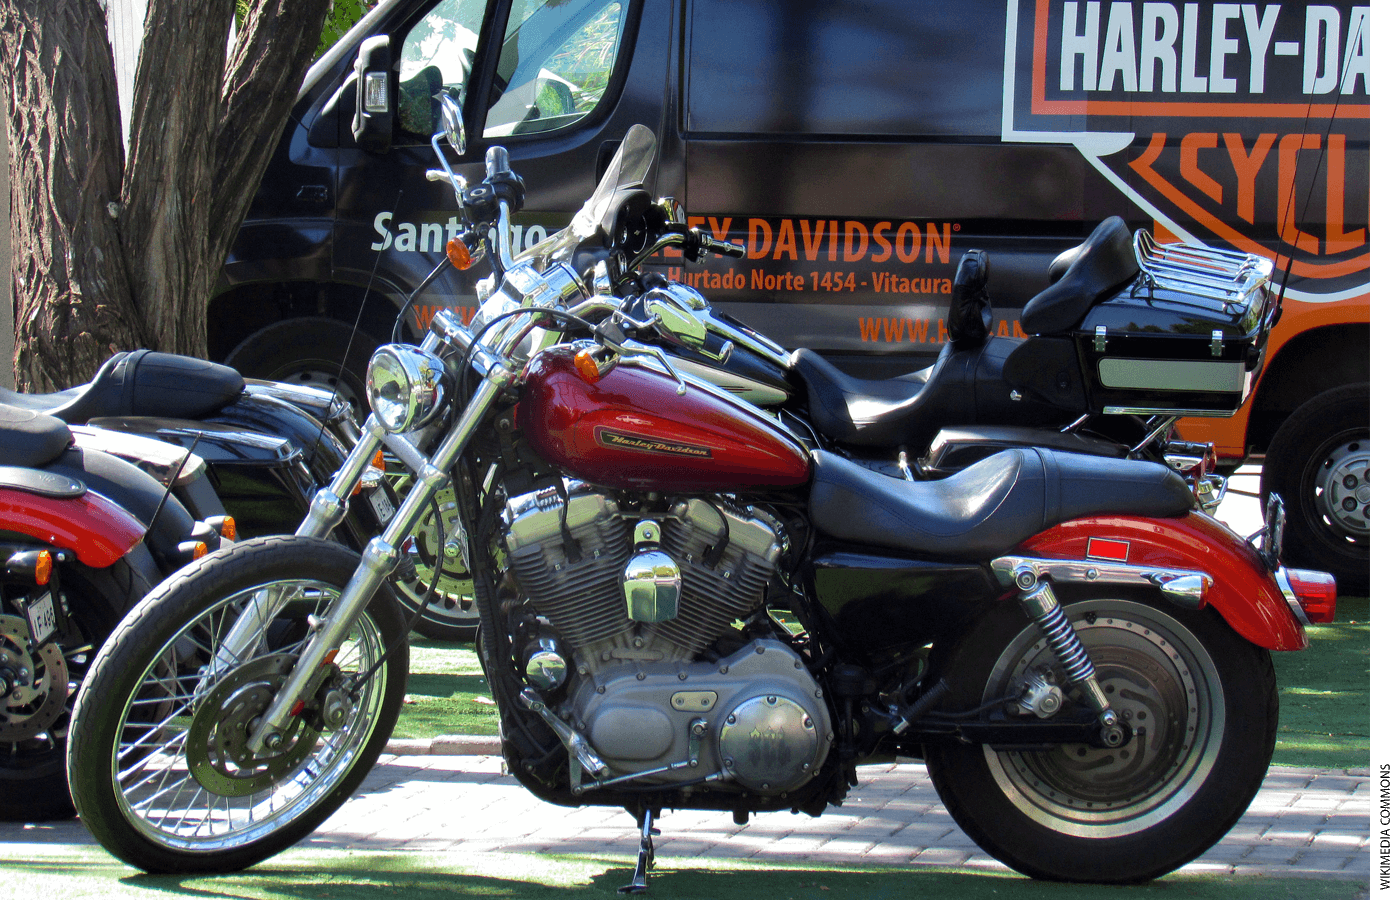 Photo of a Harley Davidson motorcycle